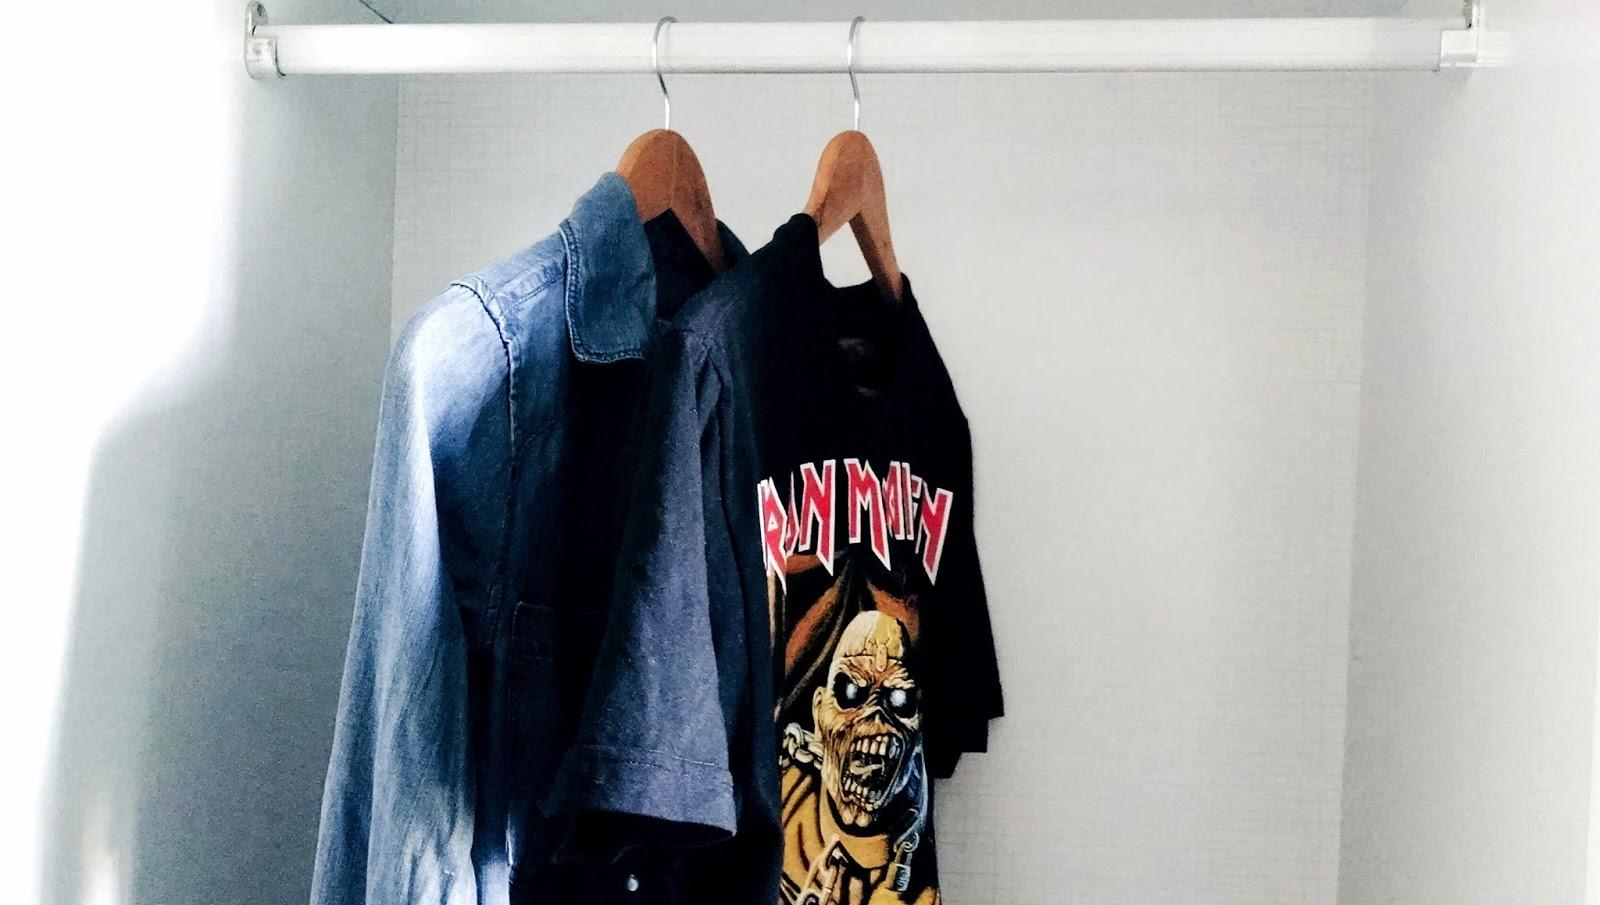 minimalismo, minimalista, guarda-roupa minimalista, armário cápsula, armário minimalista,